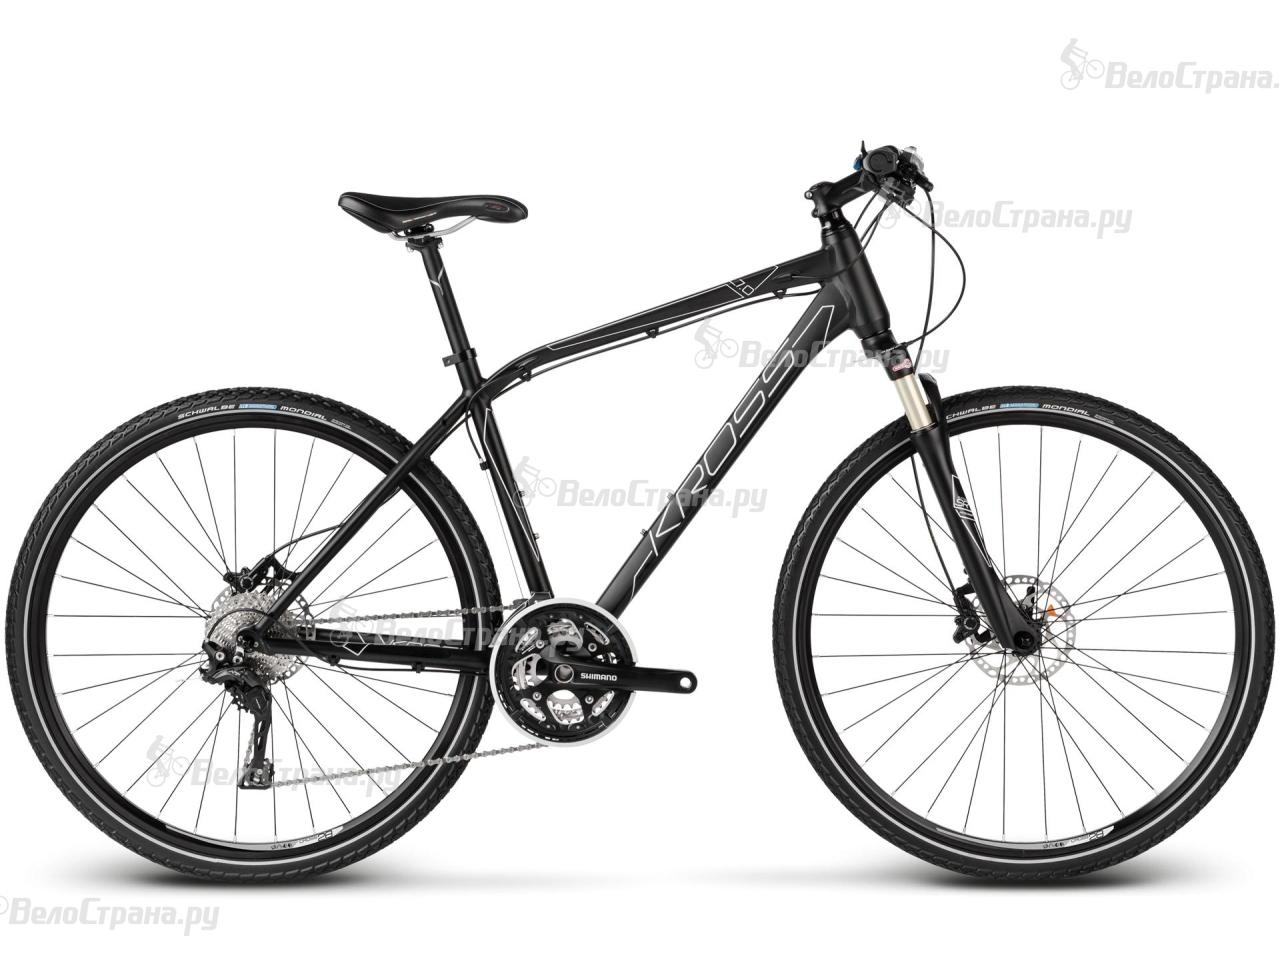 Велосипед Kross Evado 7.0 (2017) велосипед kross lea f2 2017